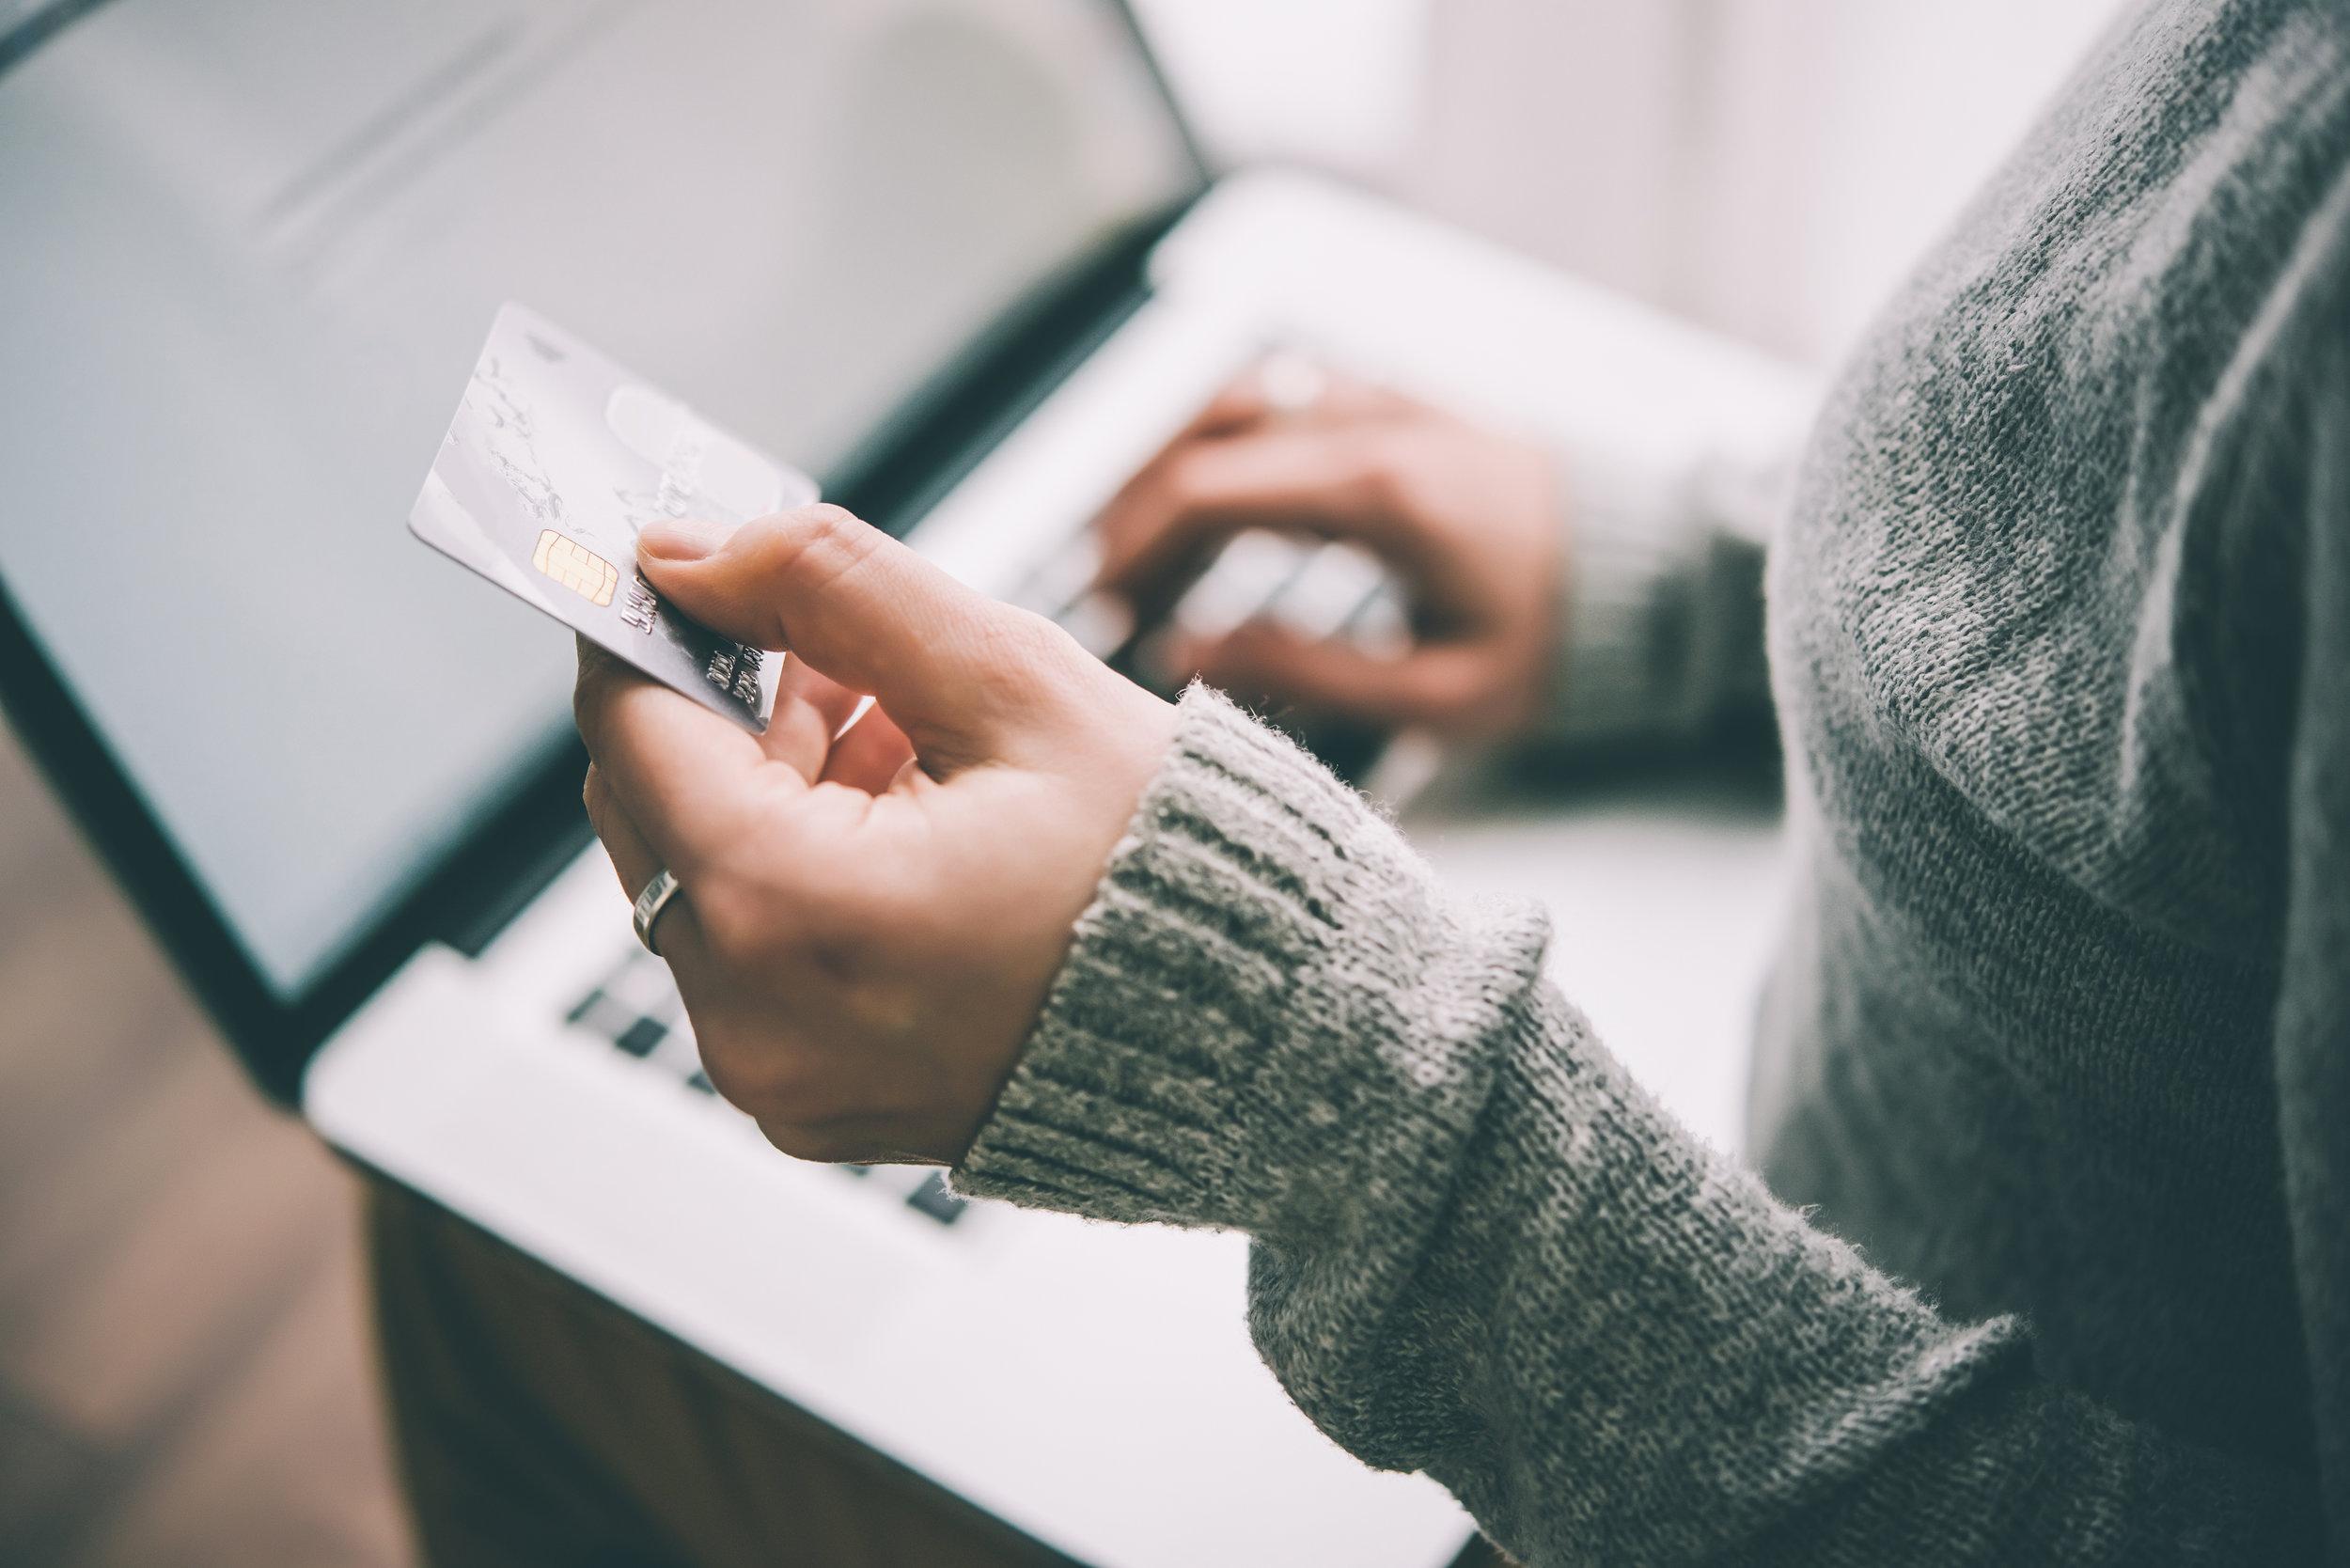 Credit Card Computer in Sweater.jpg